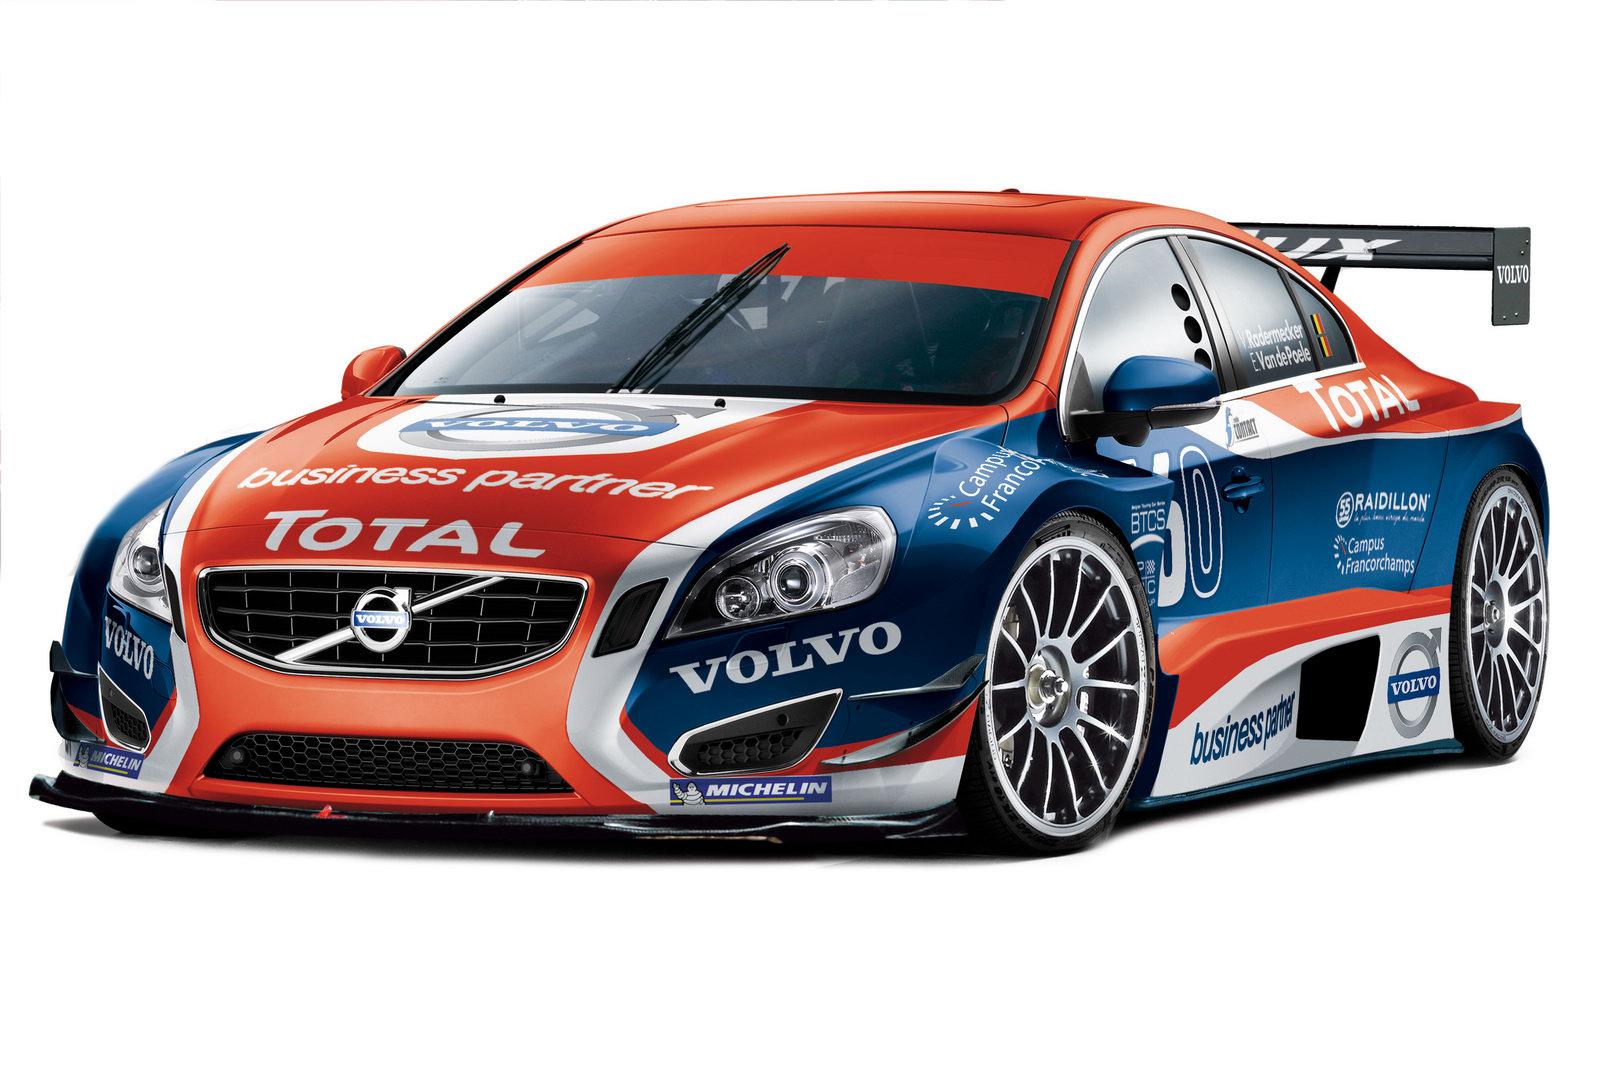 Volvo-S60-Race-Car-free-hd-wallpaper-for-desktop